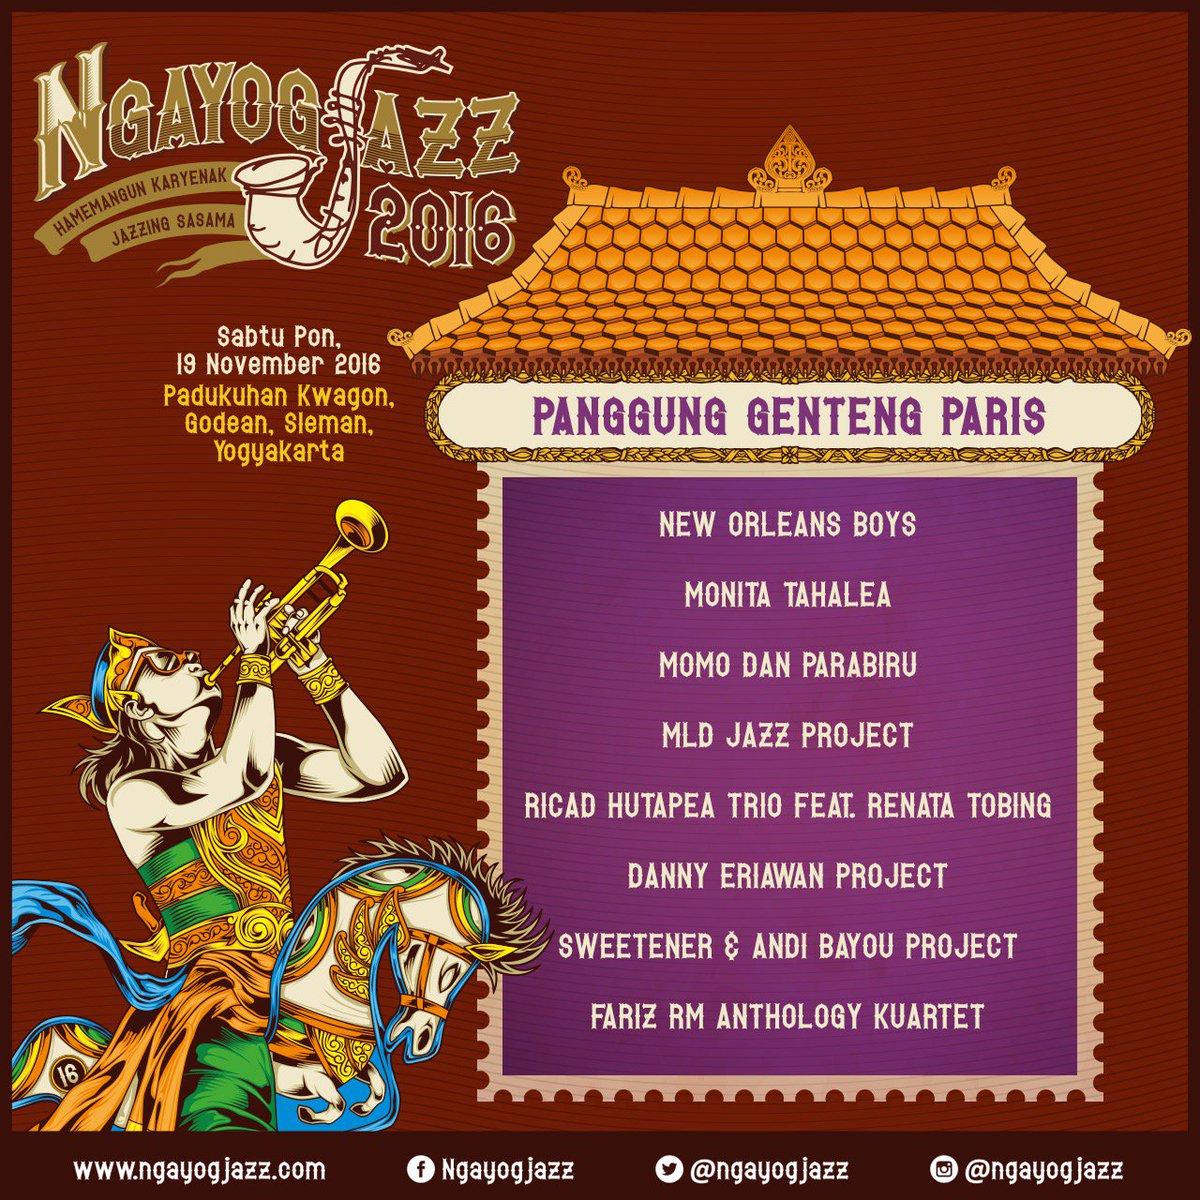 Ngayogjazz Festival 2016 Bikin Malam Minggu di Yogyakarta Makin Syahdu